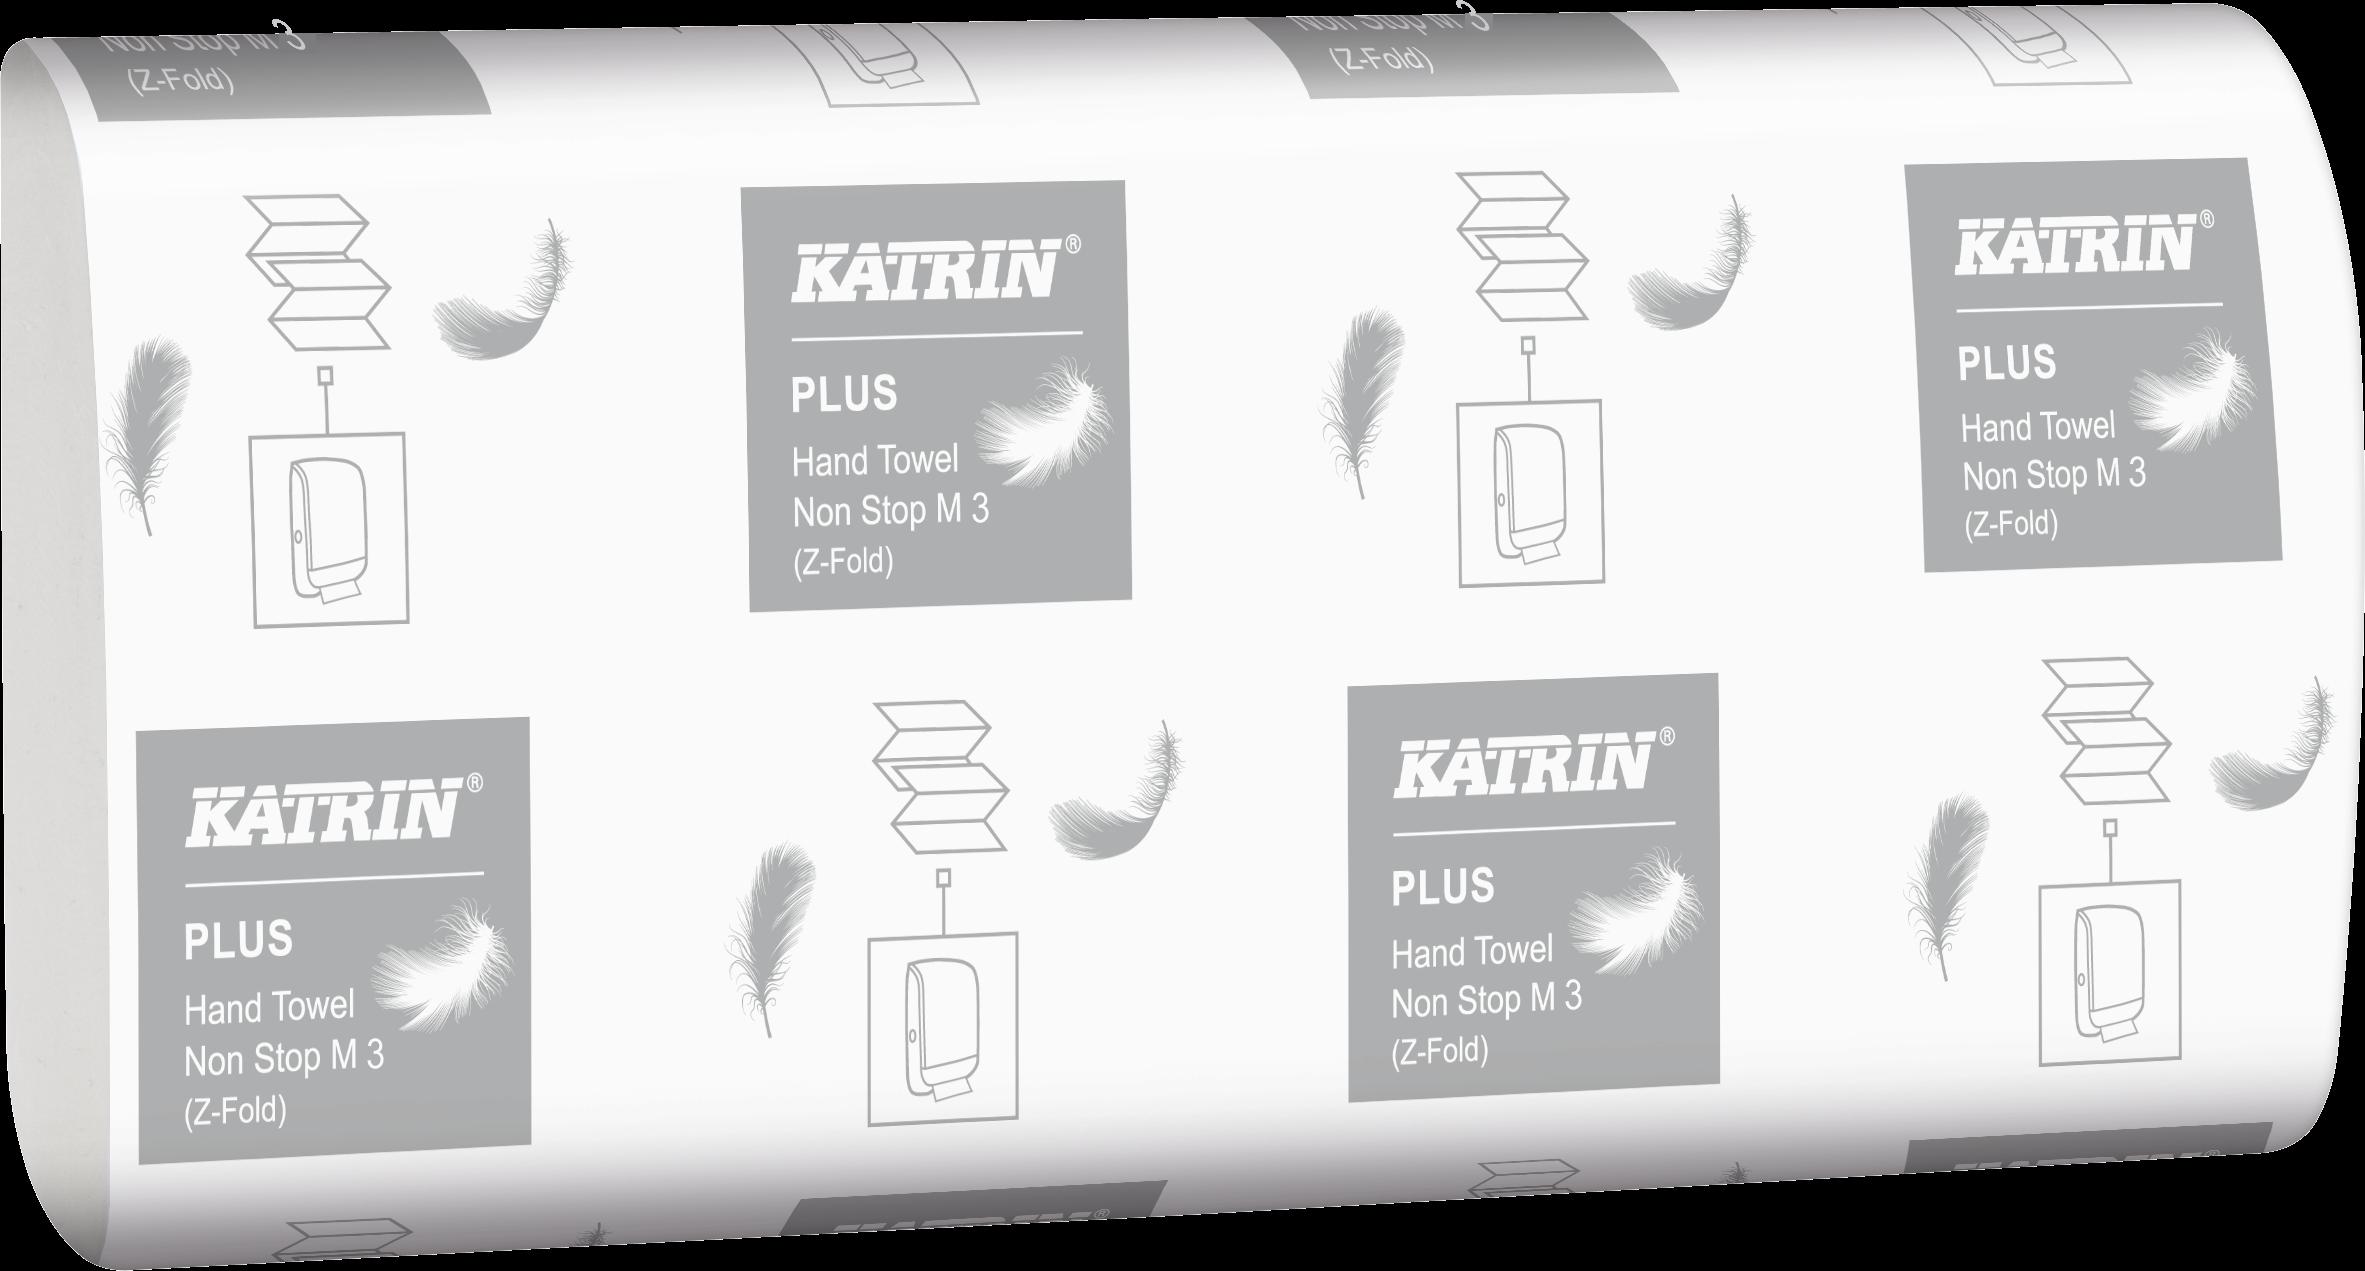 Katrin Plus Hand Towel Non Stop M3